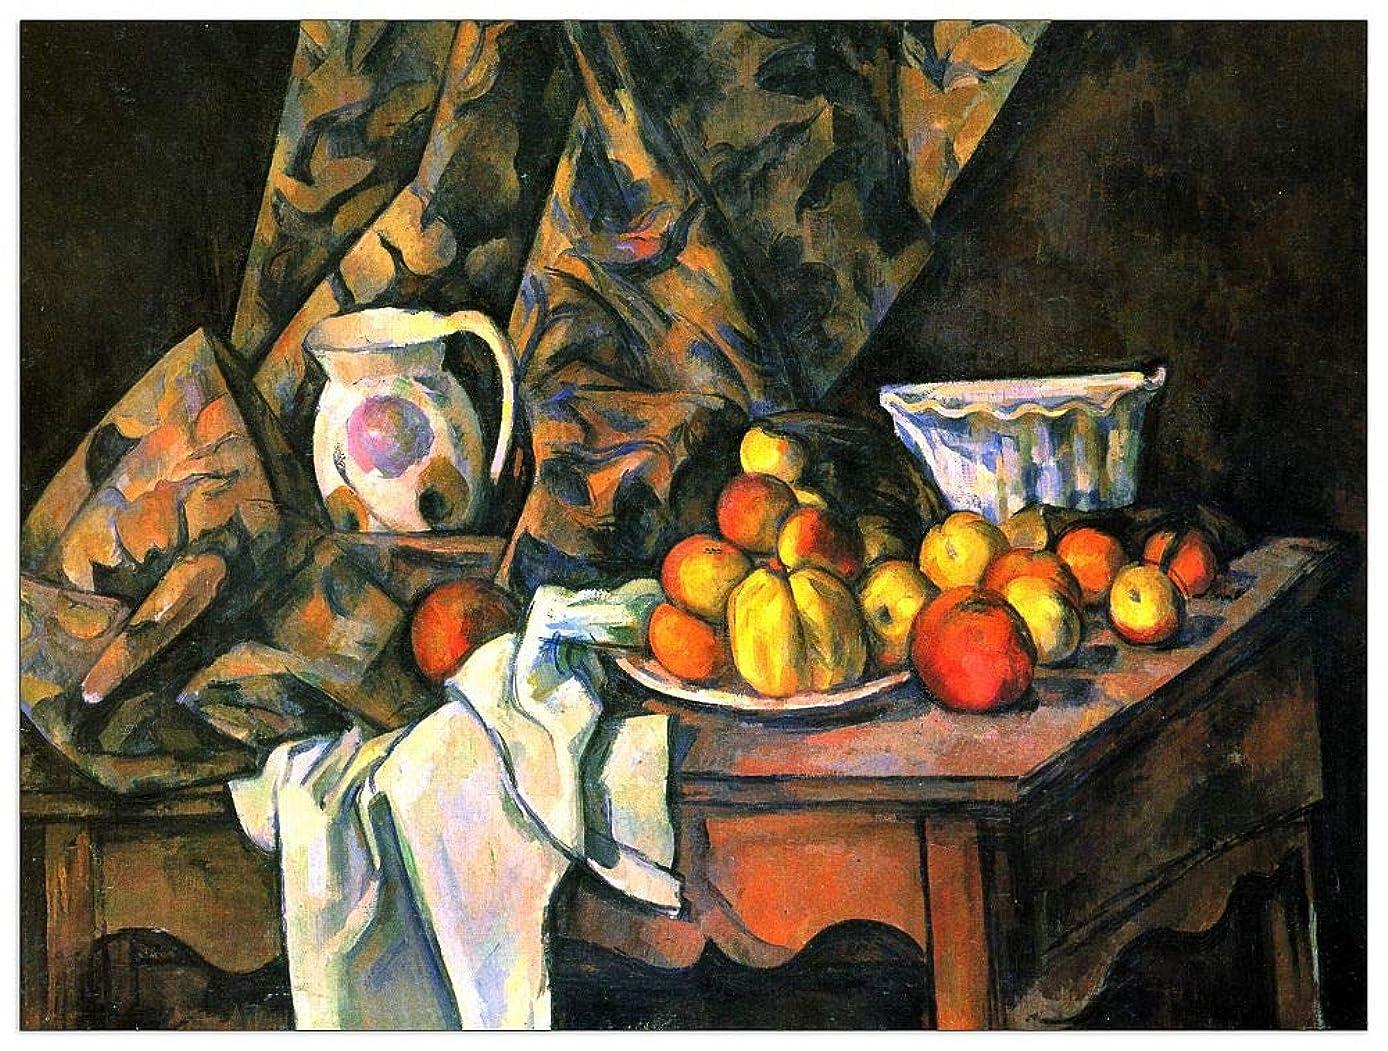 ArtPlaza TW92170 Cezanne Paul - Still Life with Apples and Peaches Decorative Panel 35.5x27.5 Inch Multicolored